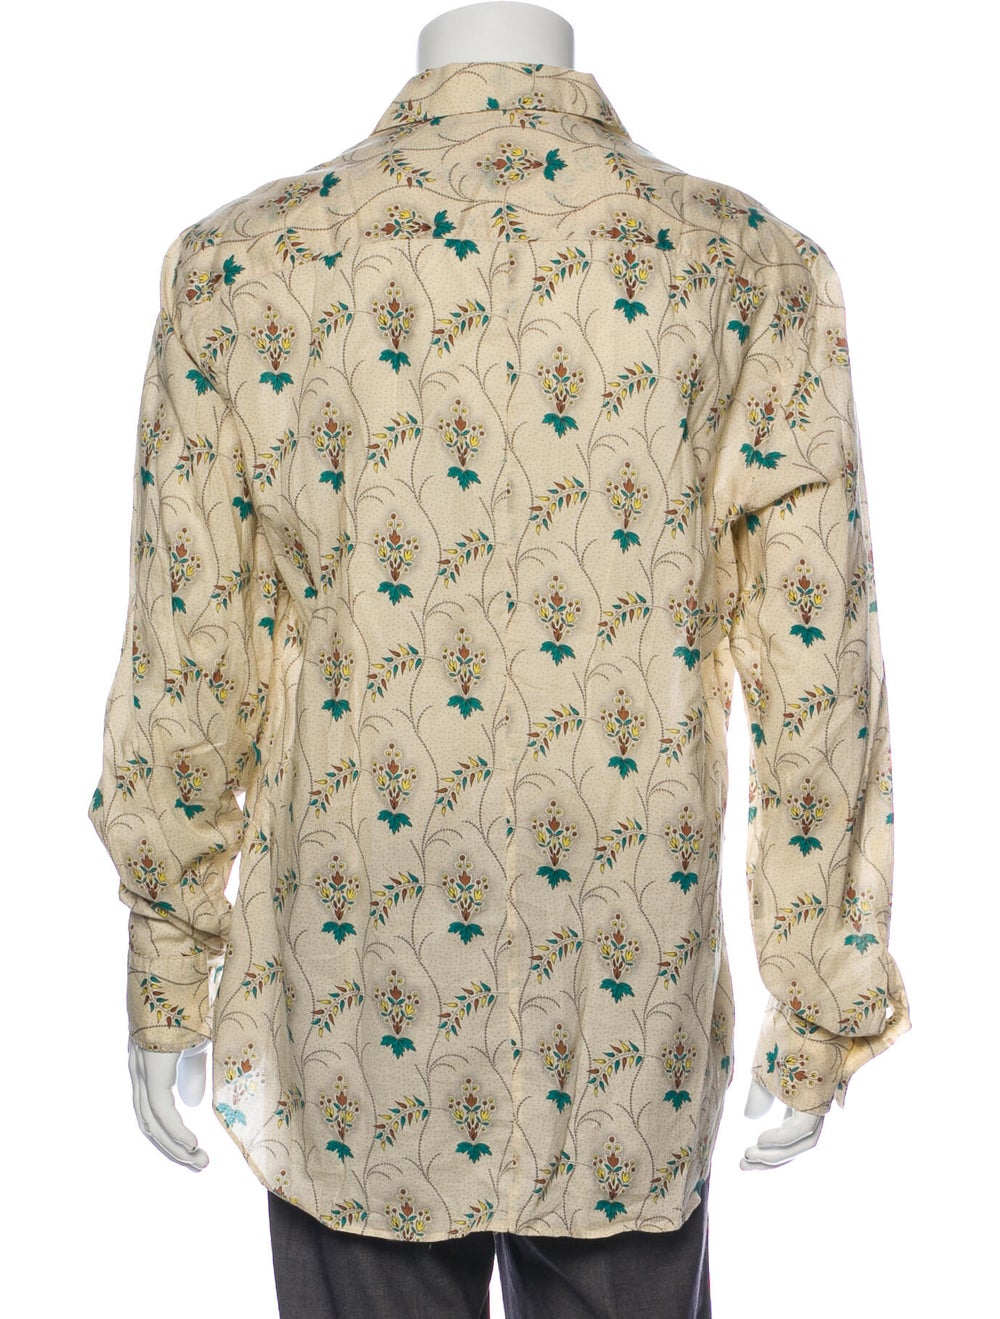 Marni Graphic Print Long Sleeve Shirt - image 3